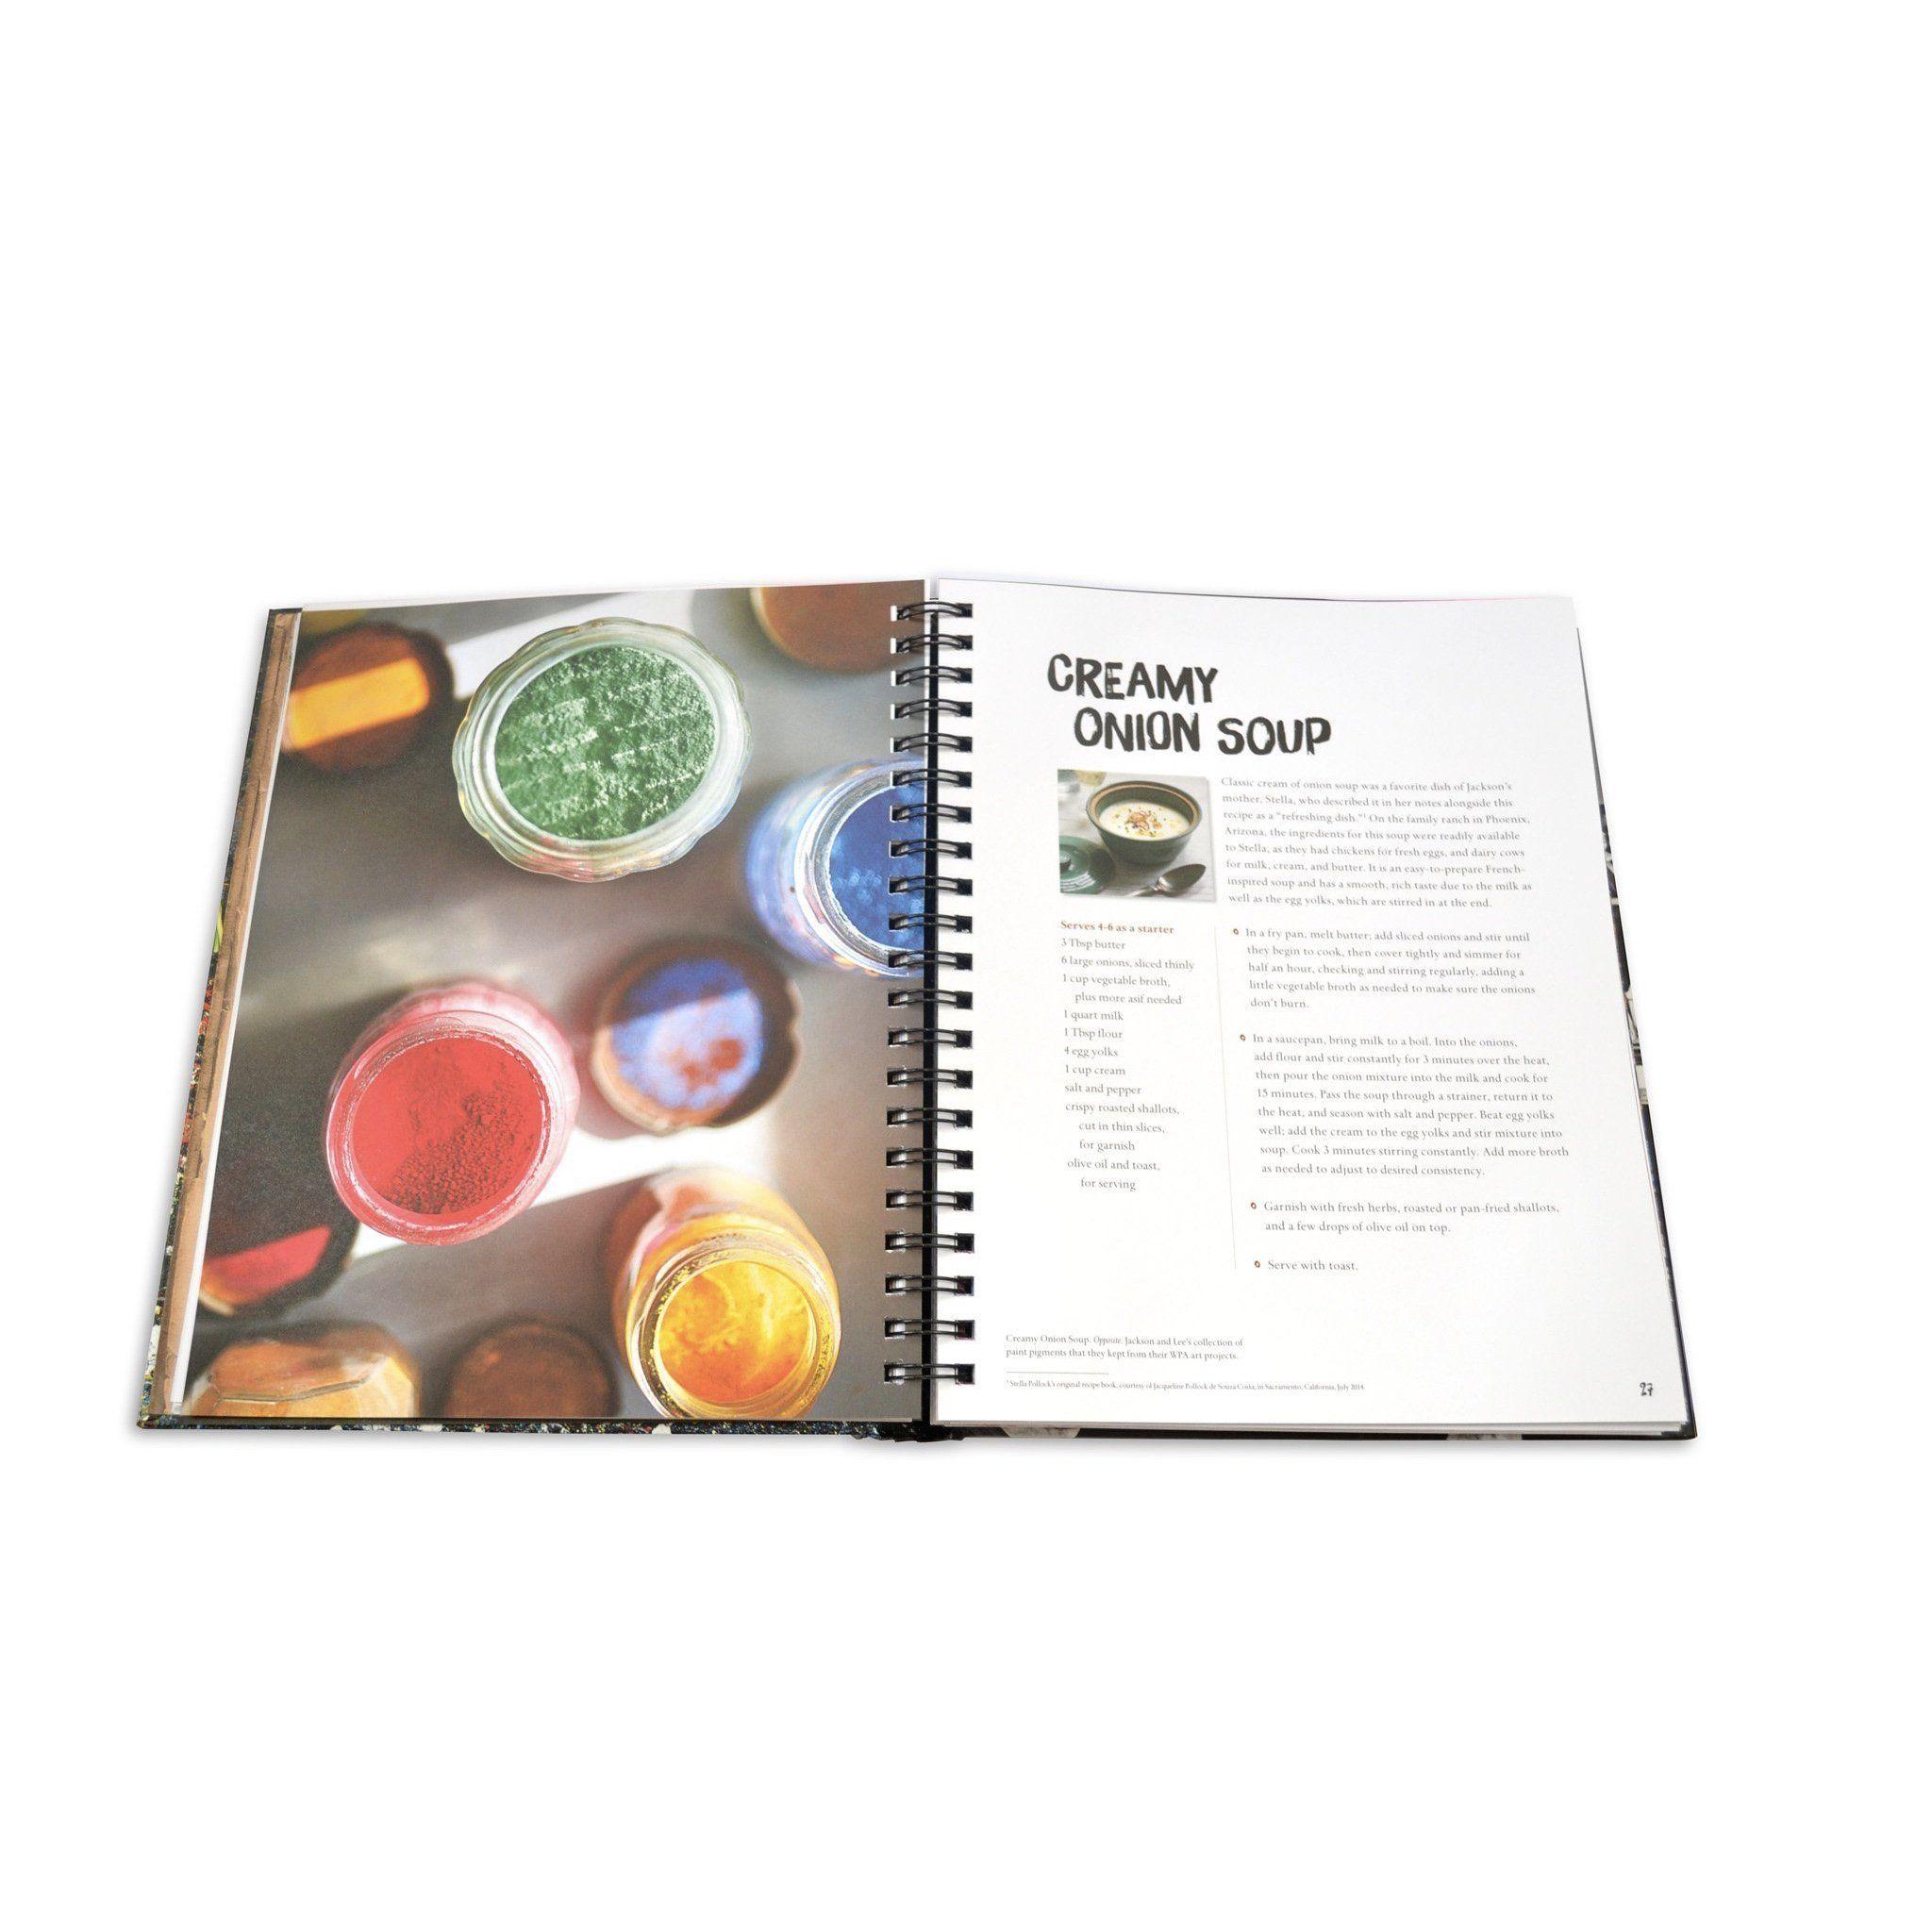 DINNER WITH JACKSON POLLOCK: RECIPES, ART & NATURE